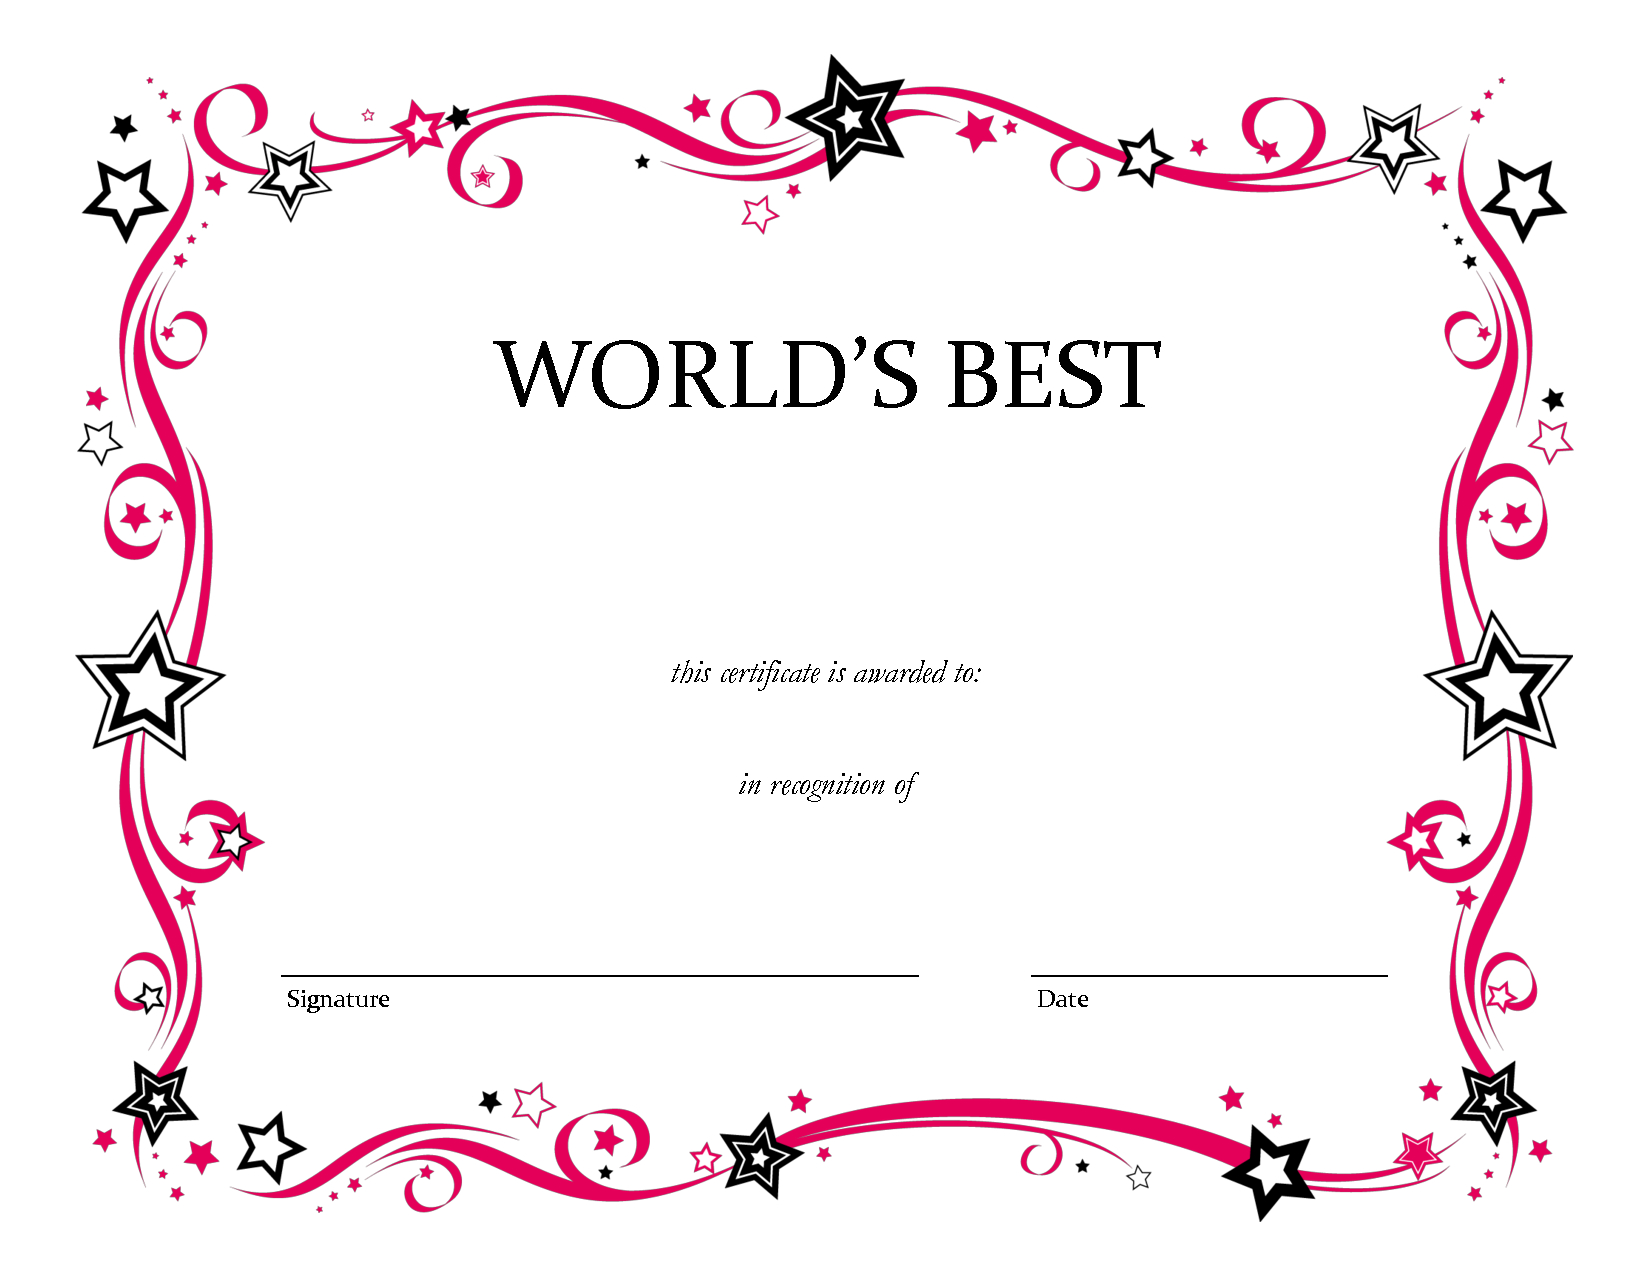 Free Printable Blank Award Certificate Templates Chainimage | Pop - Free Printable Award Certificates